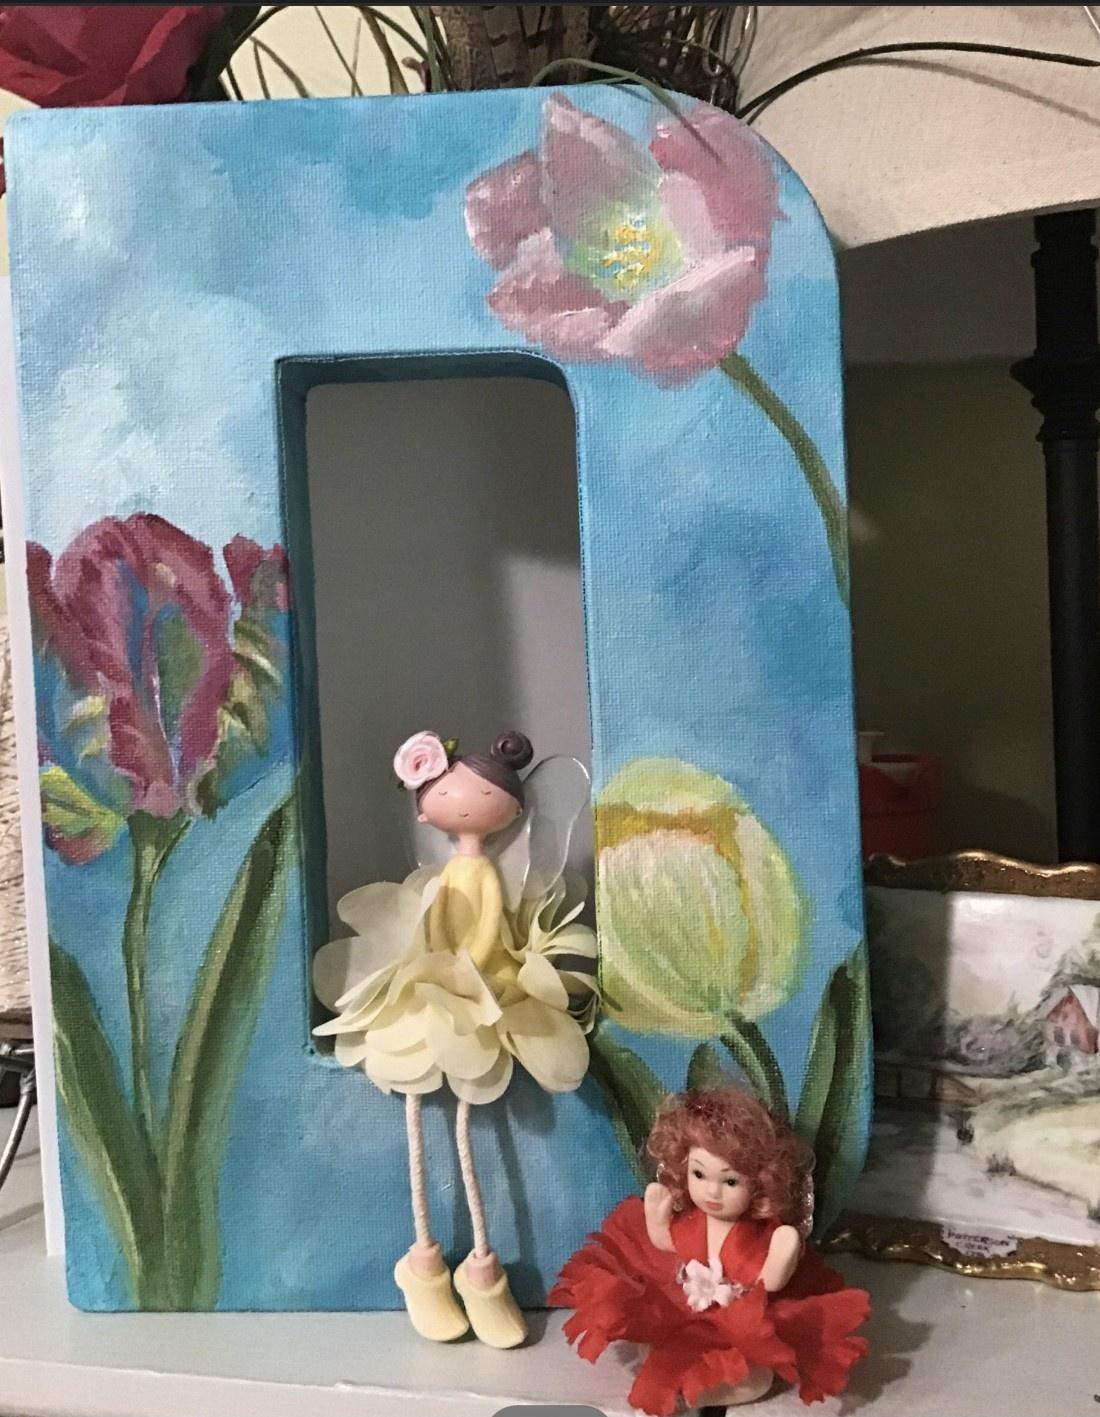 Dolly Tabb Feature Artist Created a Cheezy Cherub Art Motivation Challenge